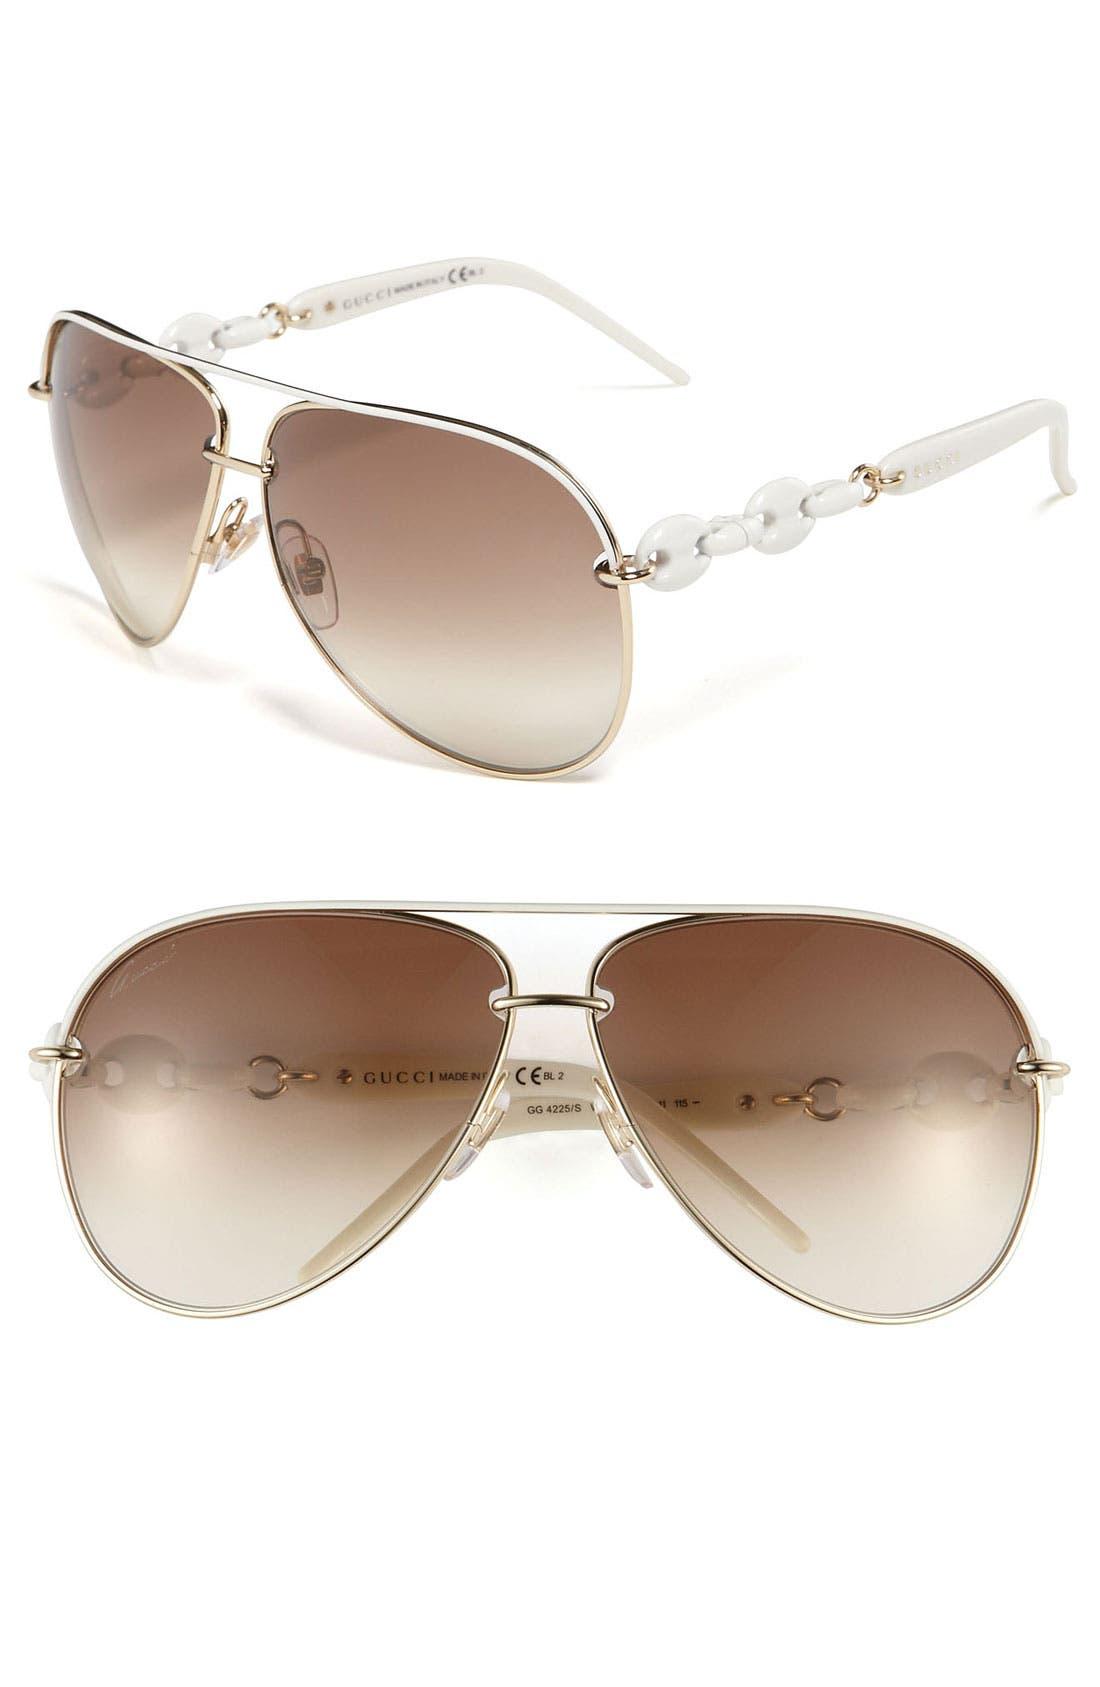 Alternate Image 1 Selected - Gucci 'Marina Chain' 63mm Aviator Sunglasses